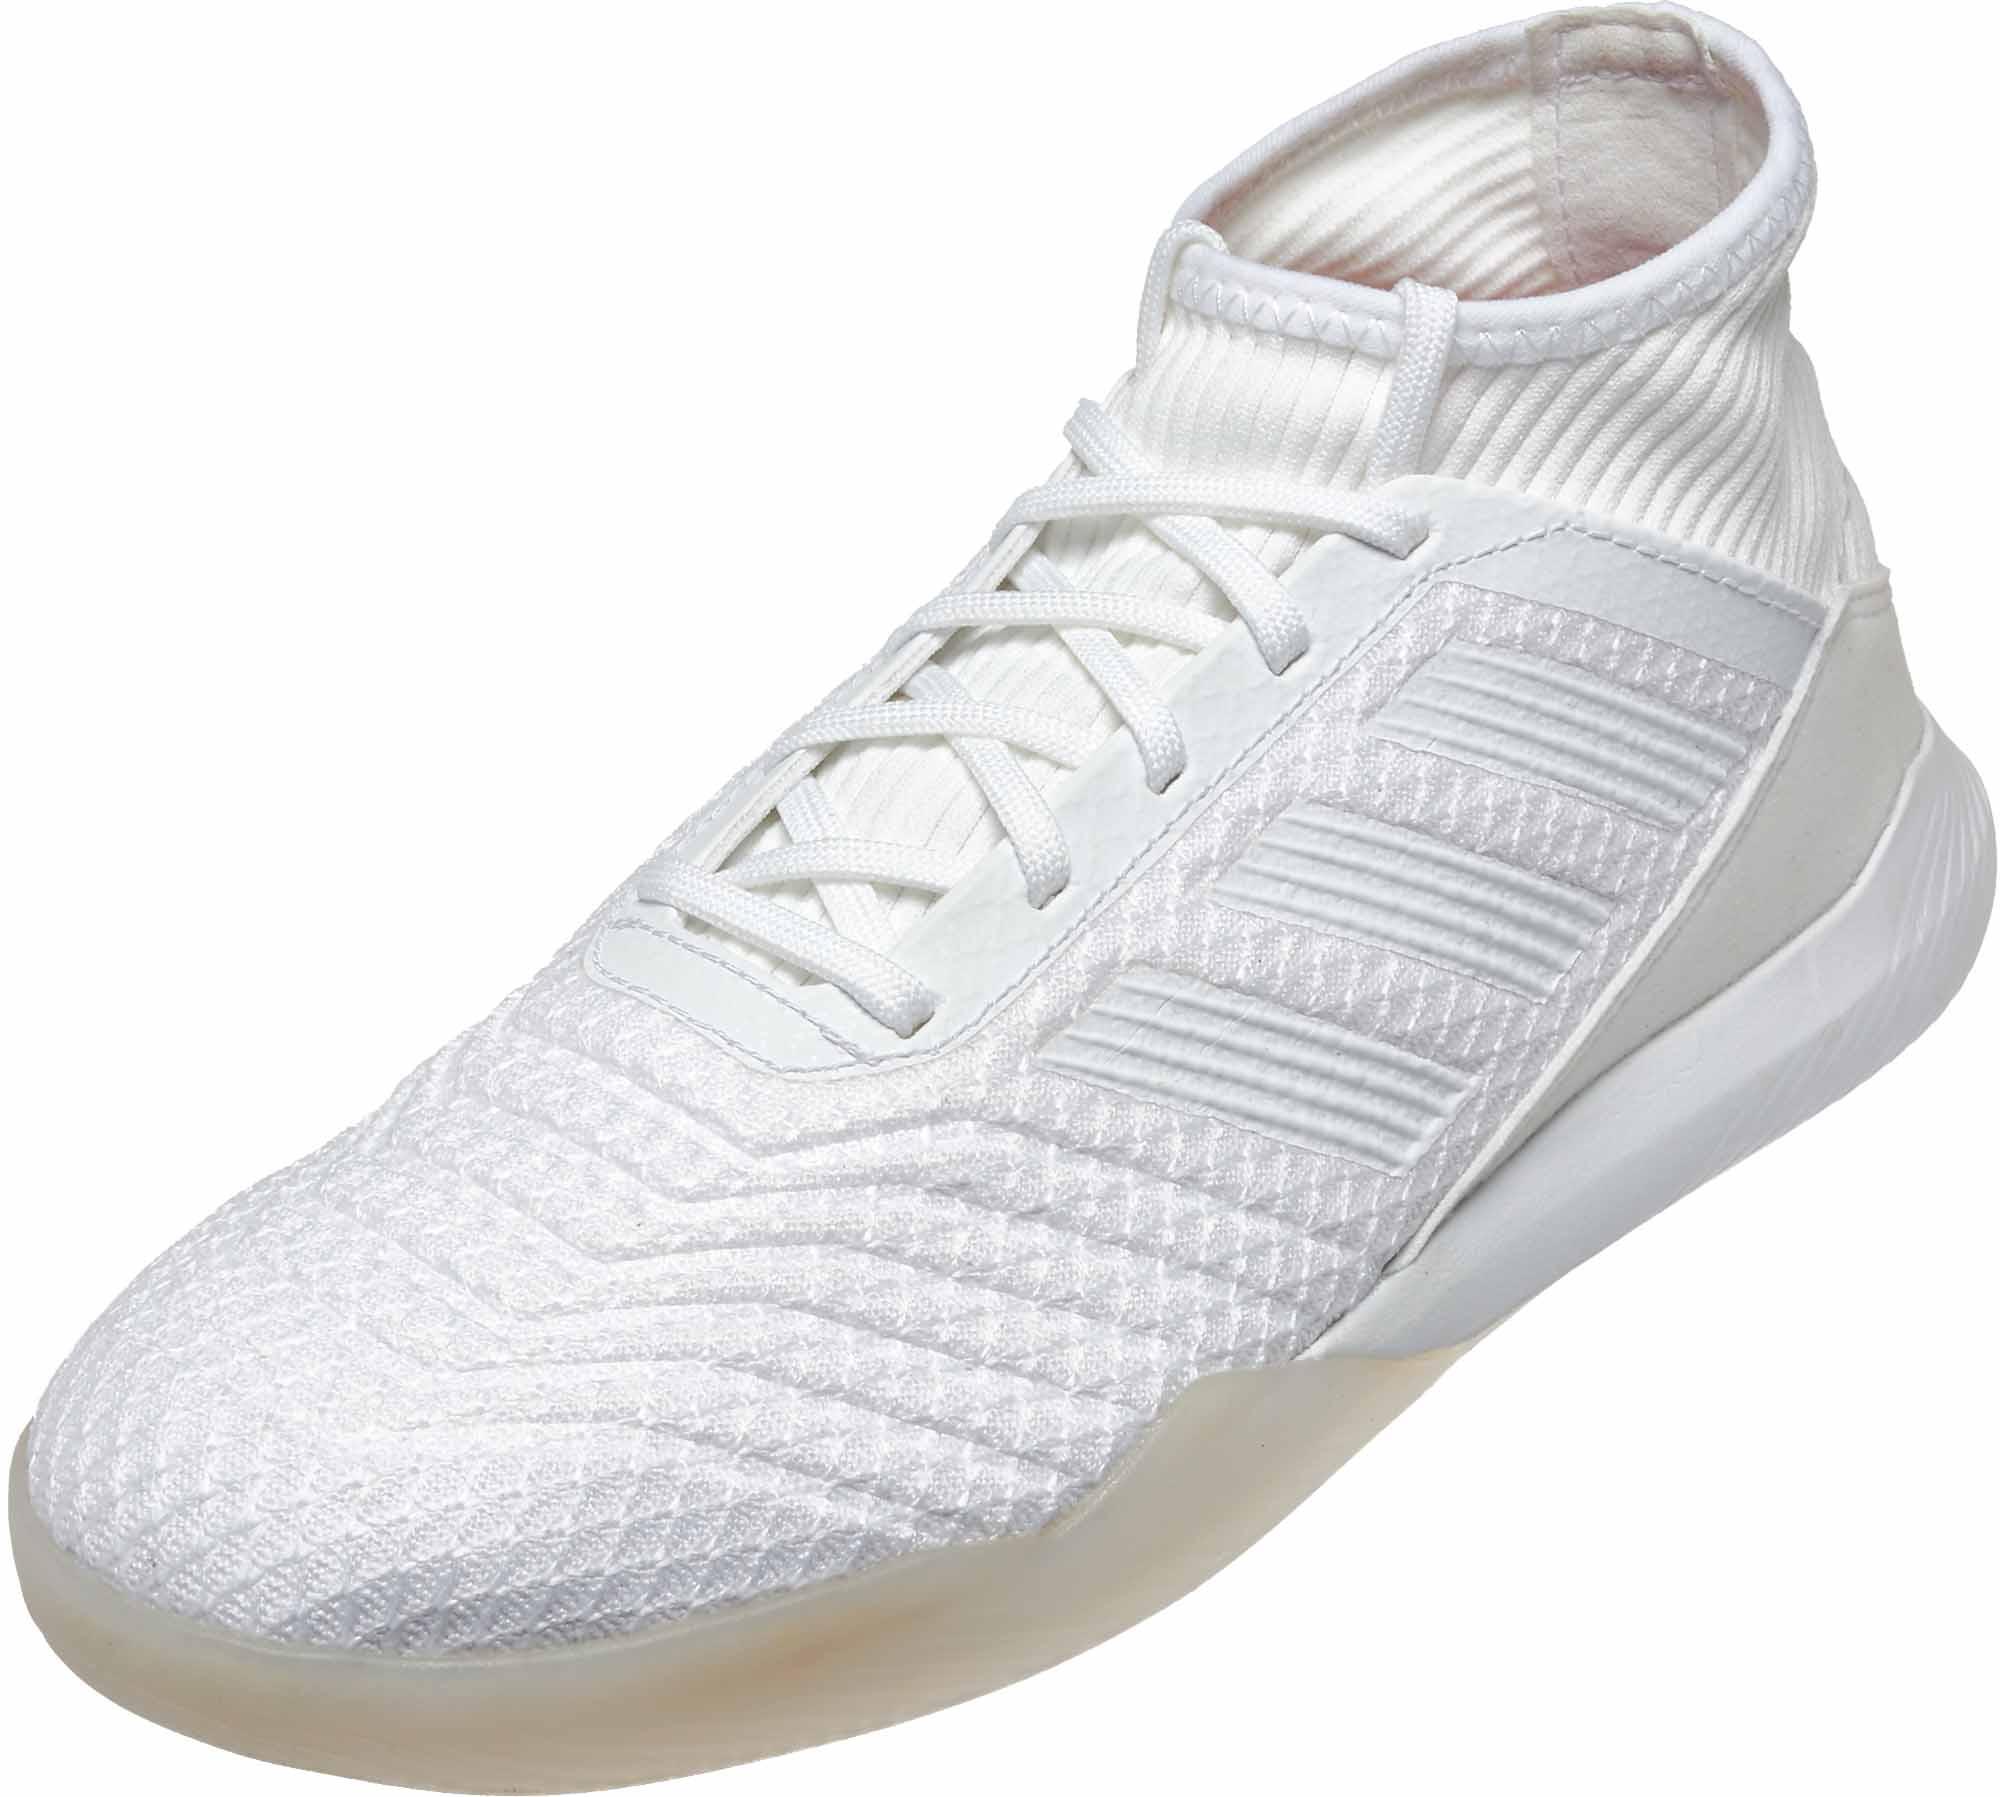 a81684ed5fab3d adidas Predator Tango 18.3 TR - White Turf Soccer Shoes